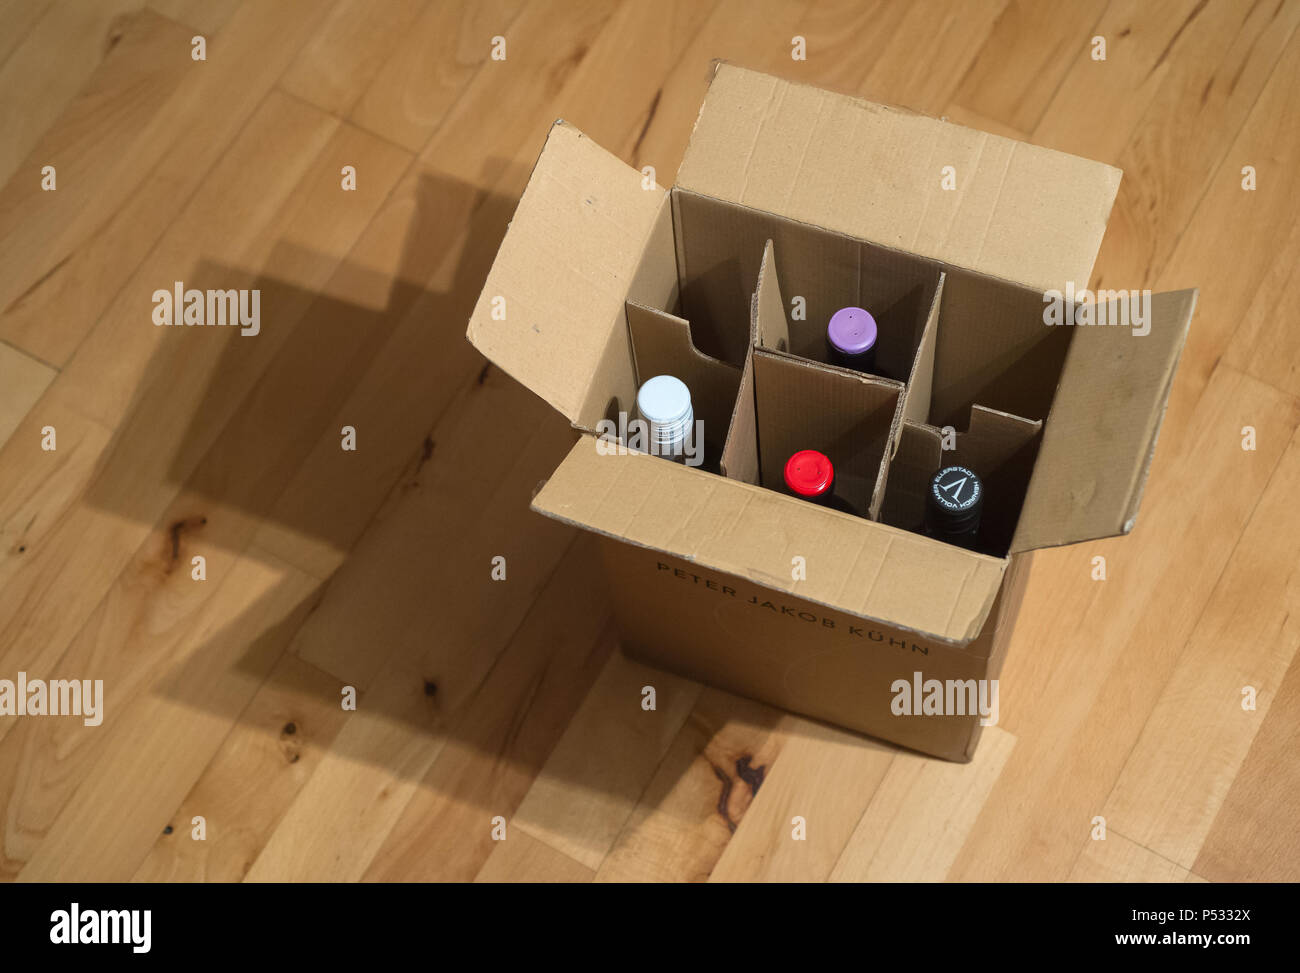 Wine carton with wine bottles on a parquet floor - Stock Image